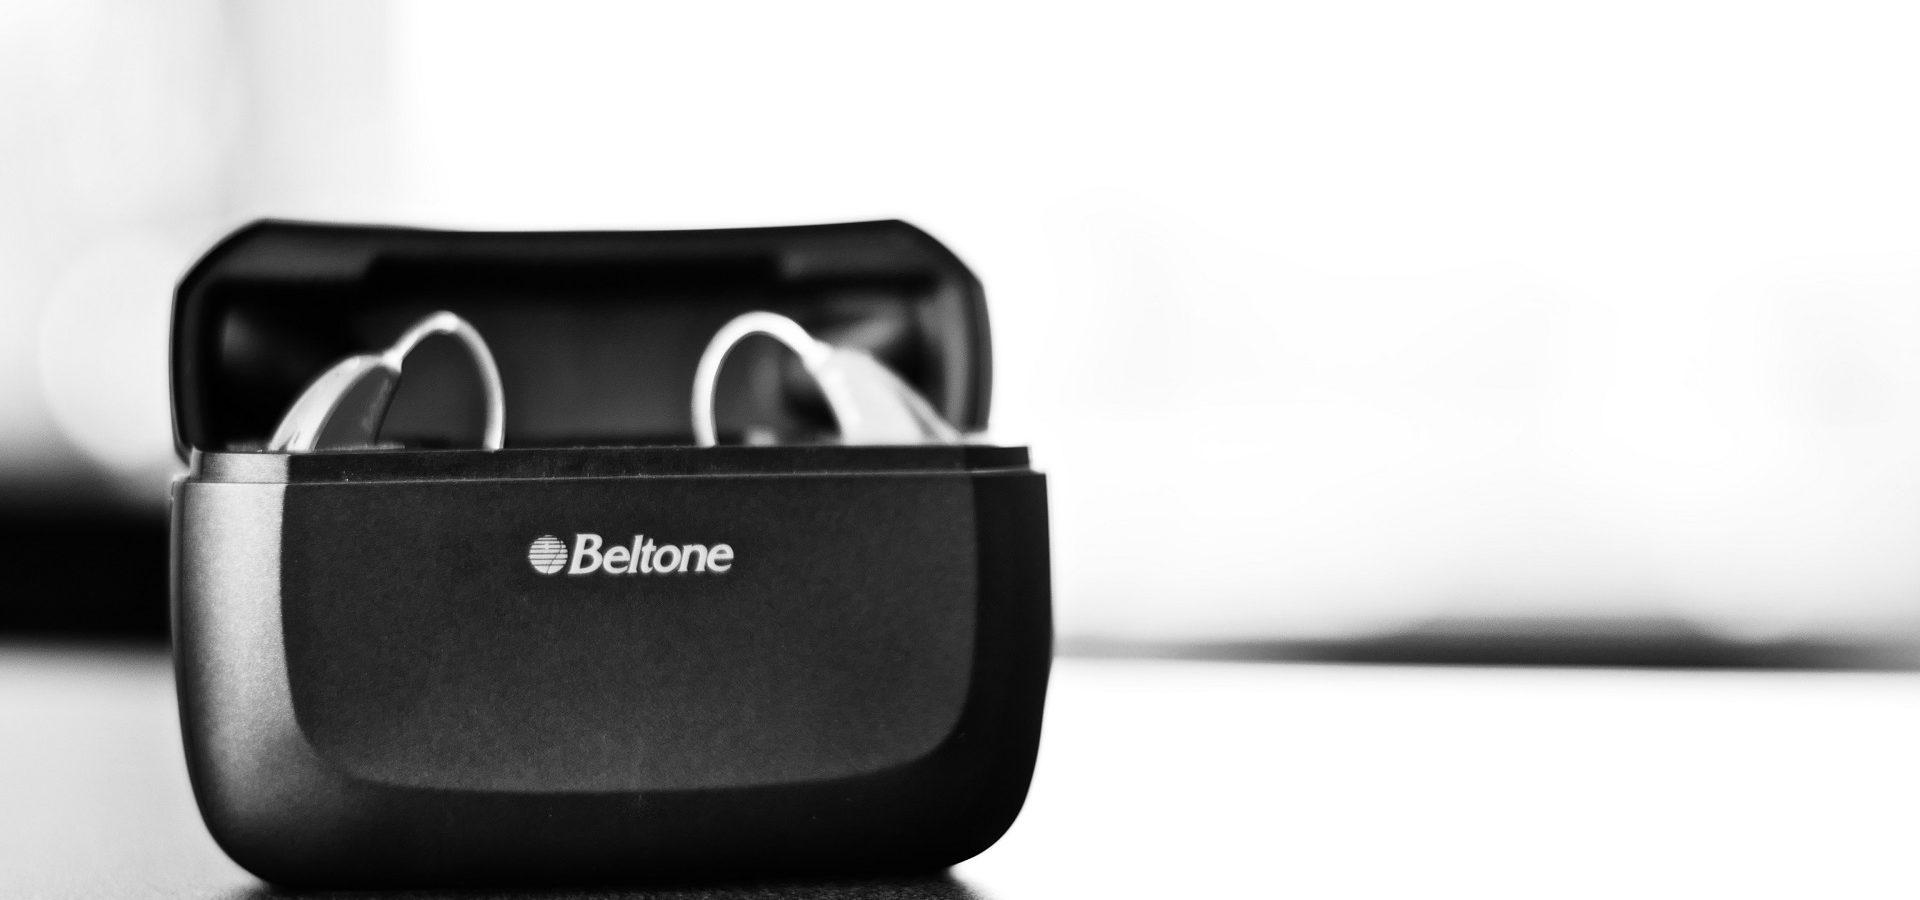 Beltone hearing aids black and white photo